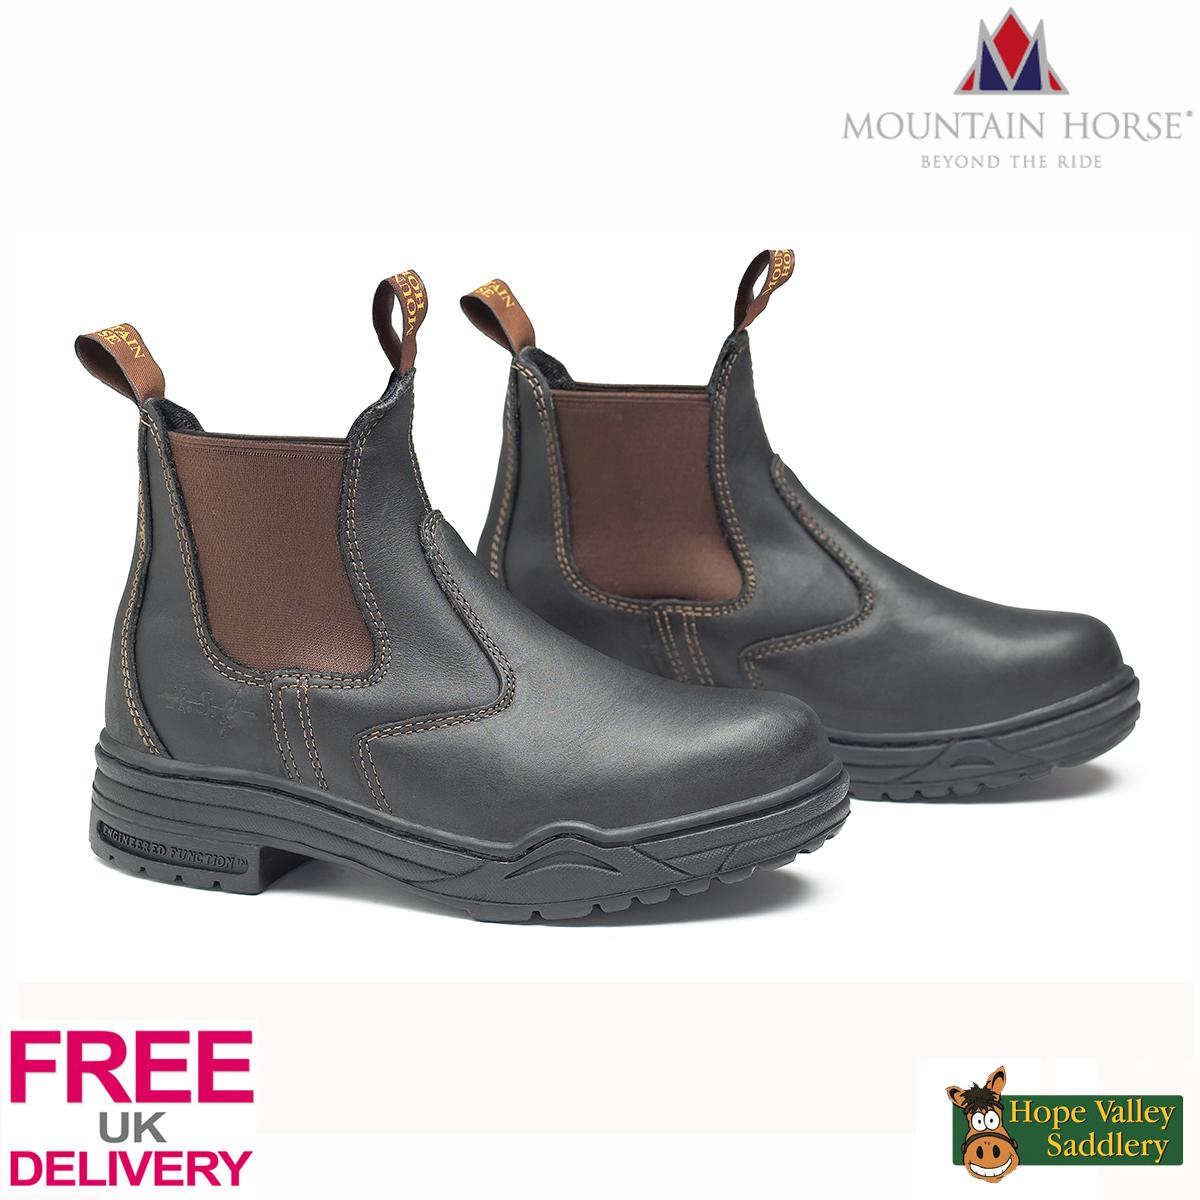 Mountain horse protective ** jodhpur boot ** protective free uk livraison ** 7e42af